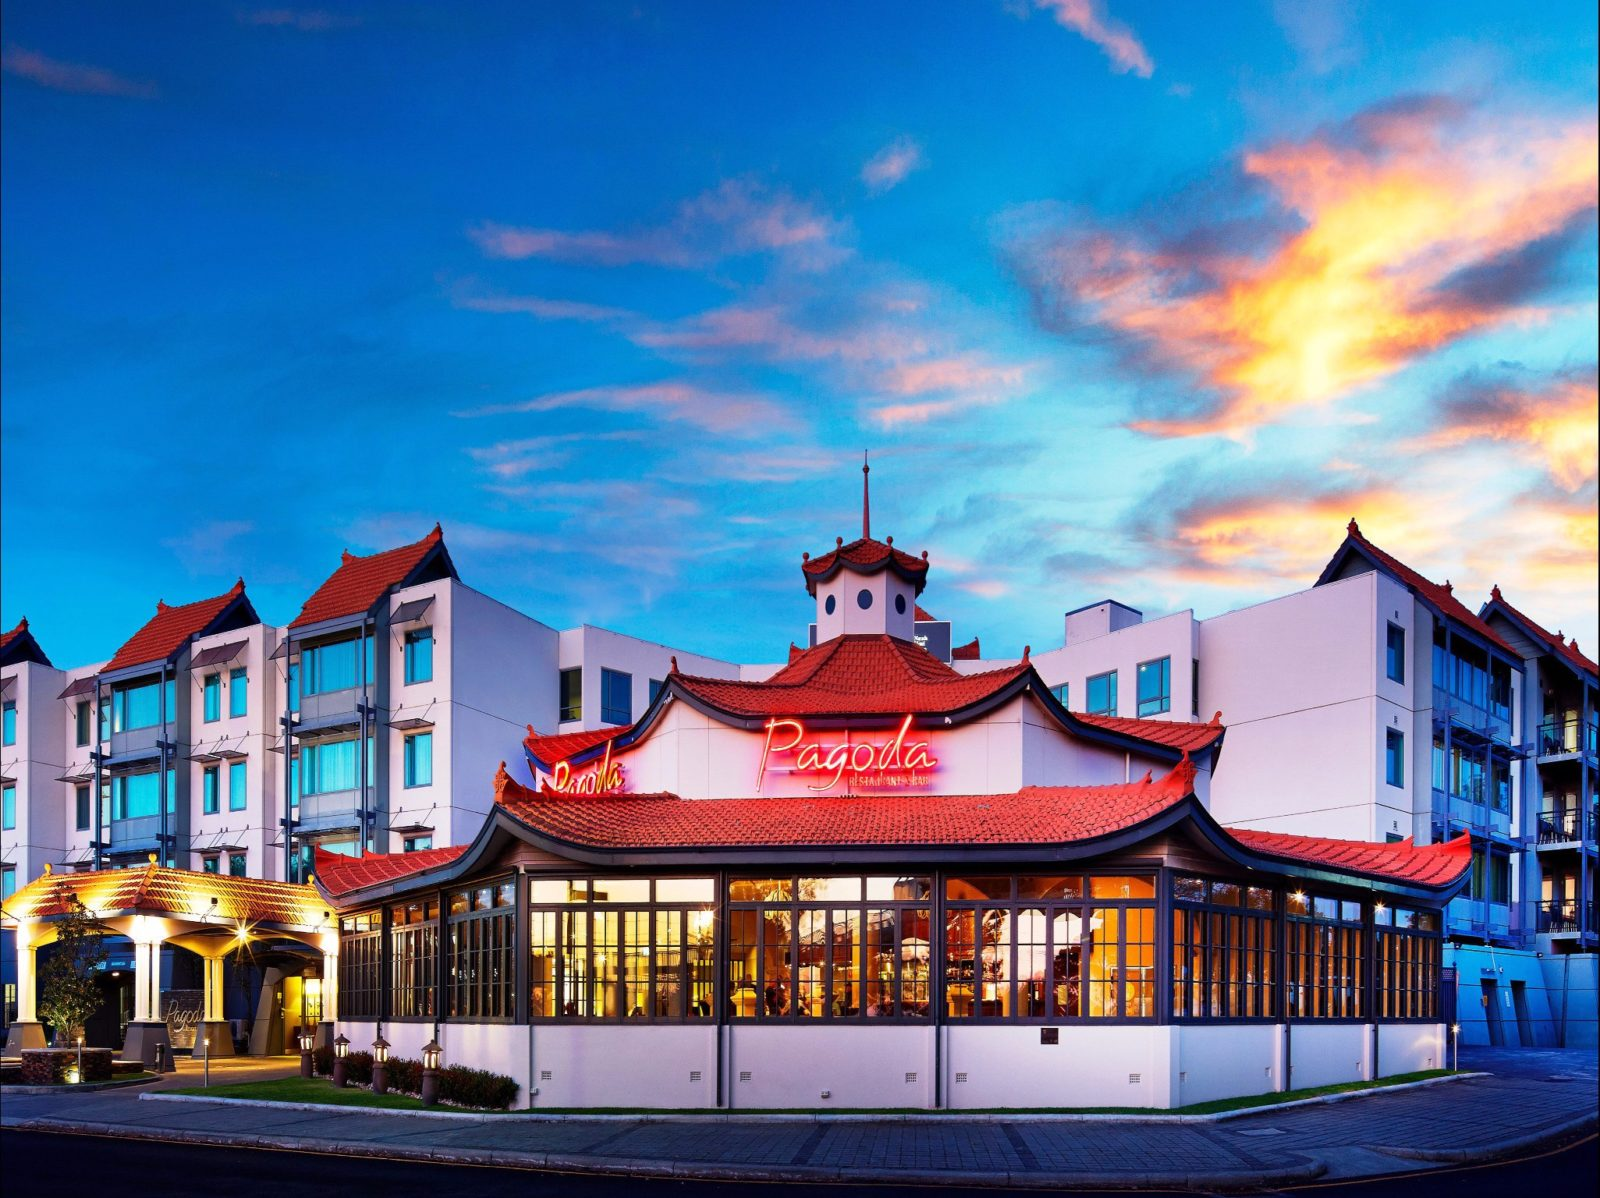 Pagoda Resort and Spa, Como, Western Australia